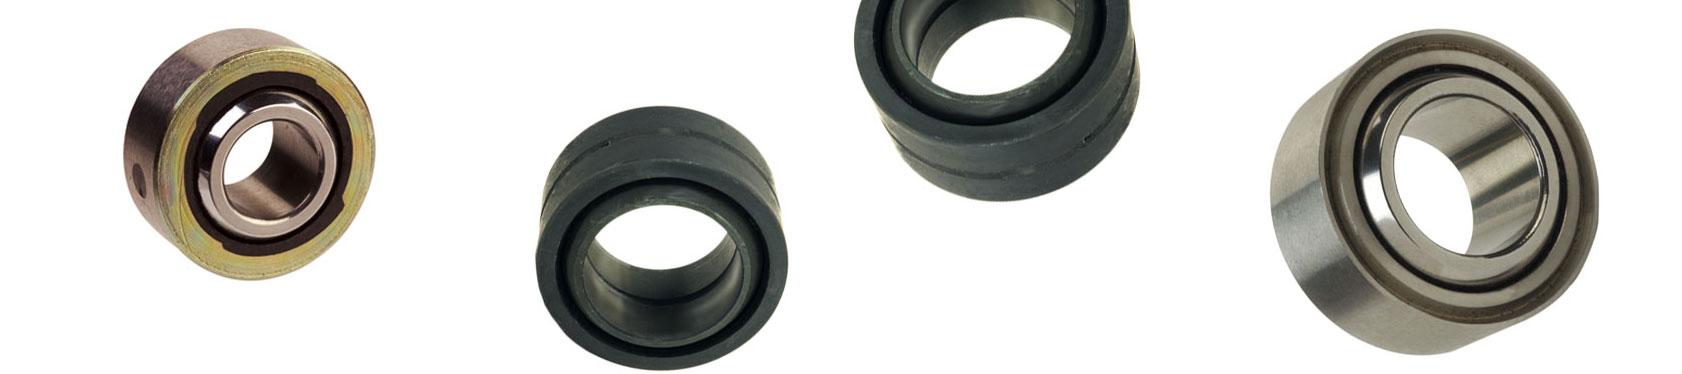 Cablecraft COM-P and J/JM Series self lubricating spherical bearings